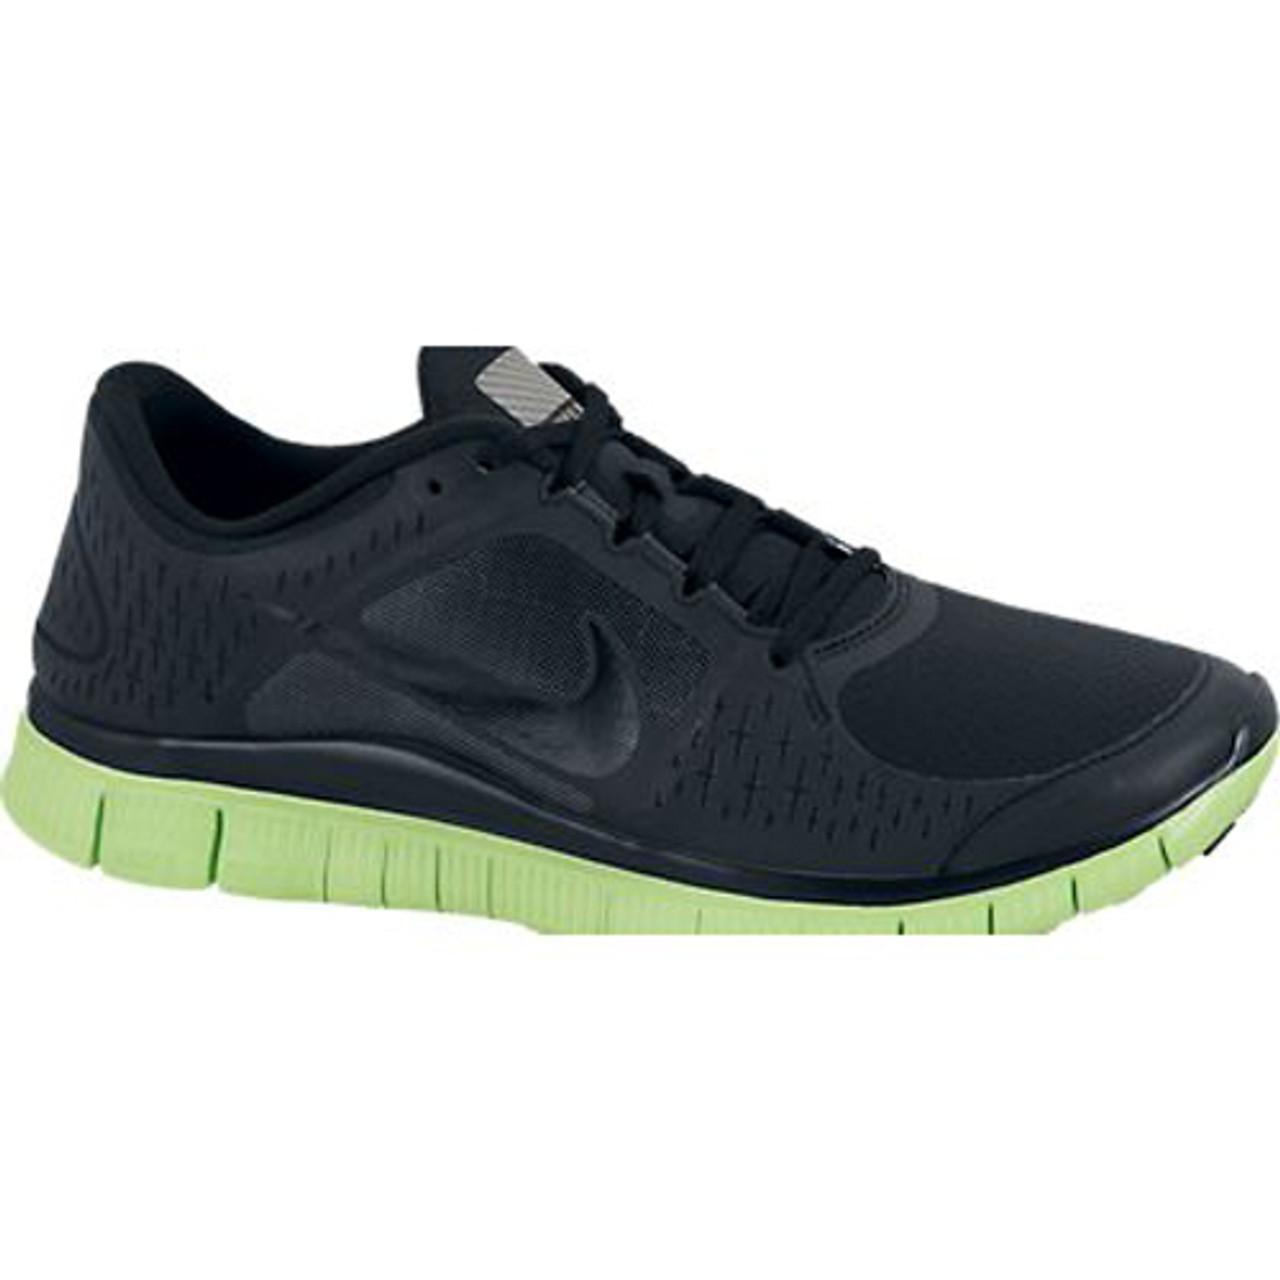 online store cee9d da033 New Nike Free Run +3 Shield Black Green Mens Running Shoes - Shop now